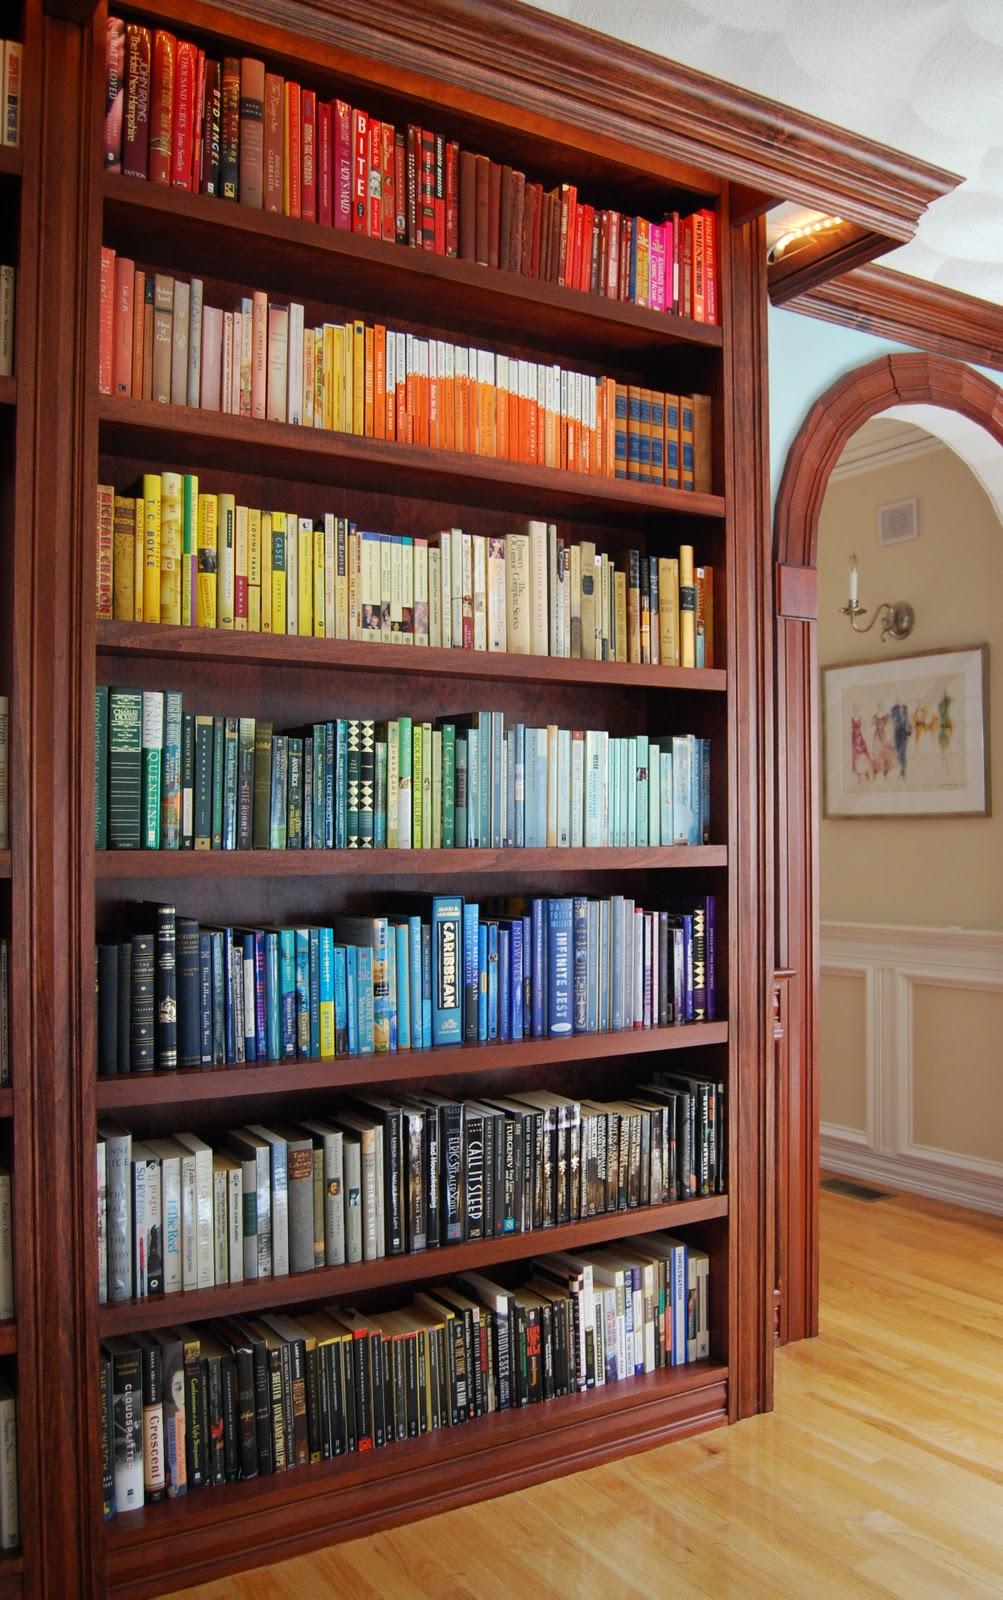 Co colour coordinated bookshelf - All The Blogs Mentioning Color Coding Bookshelves